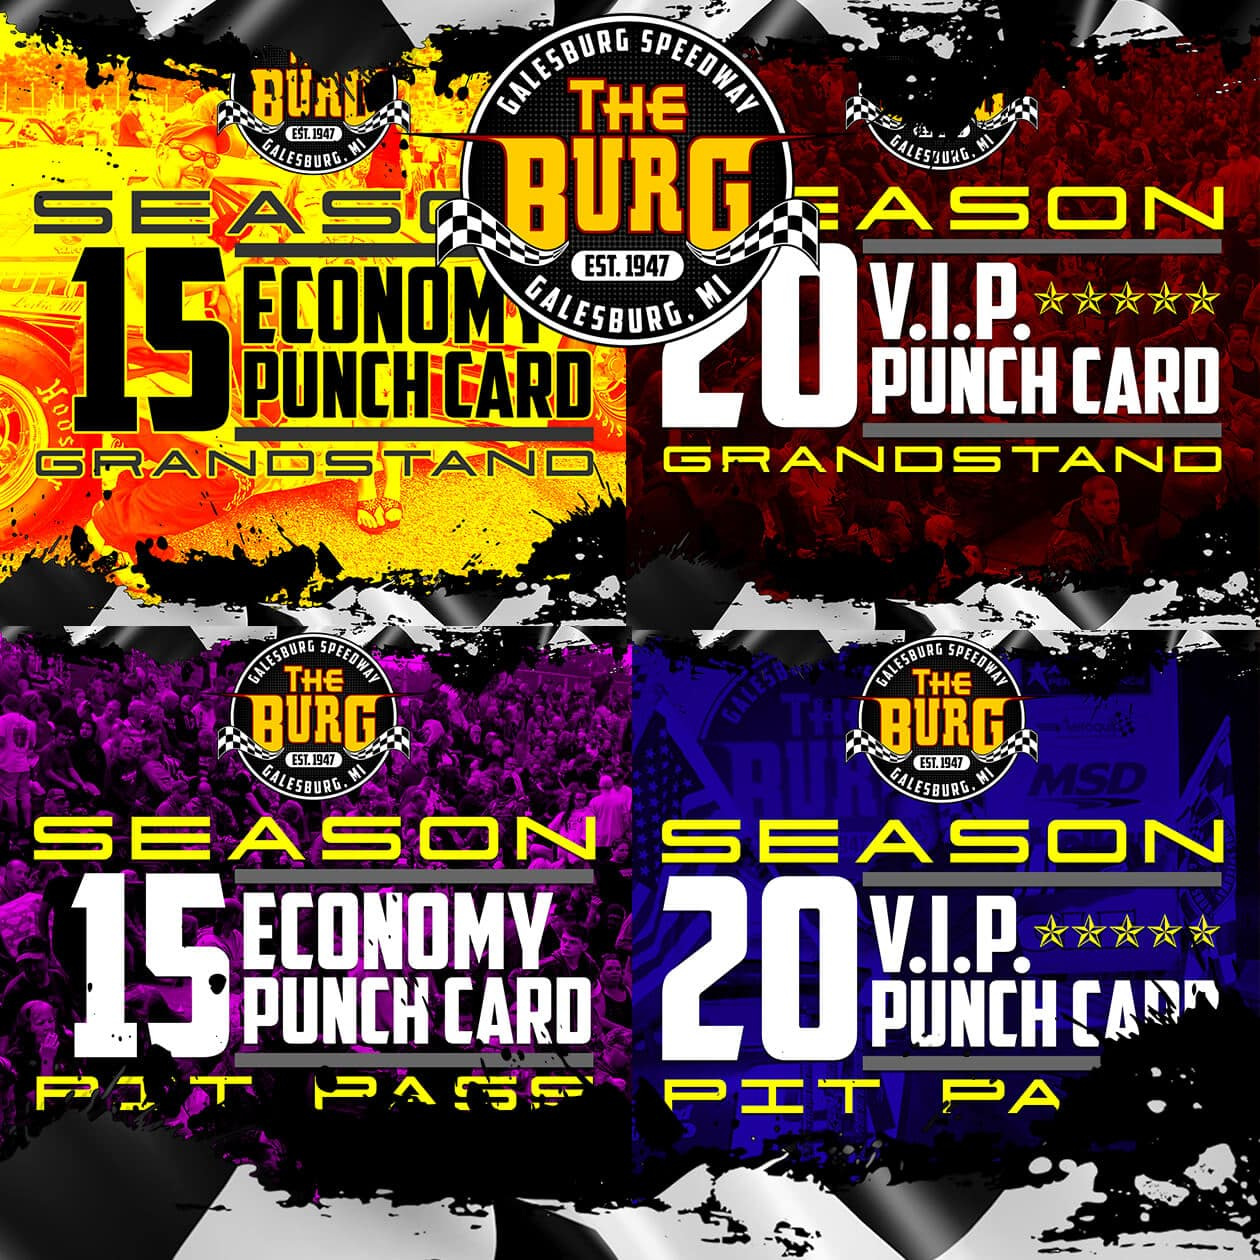 Season Punch Passes